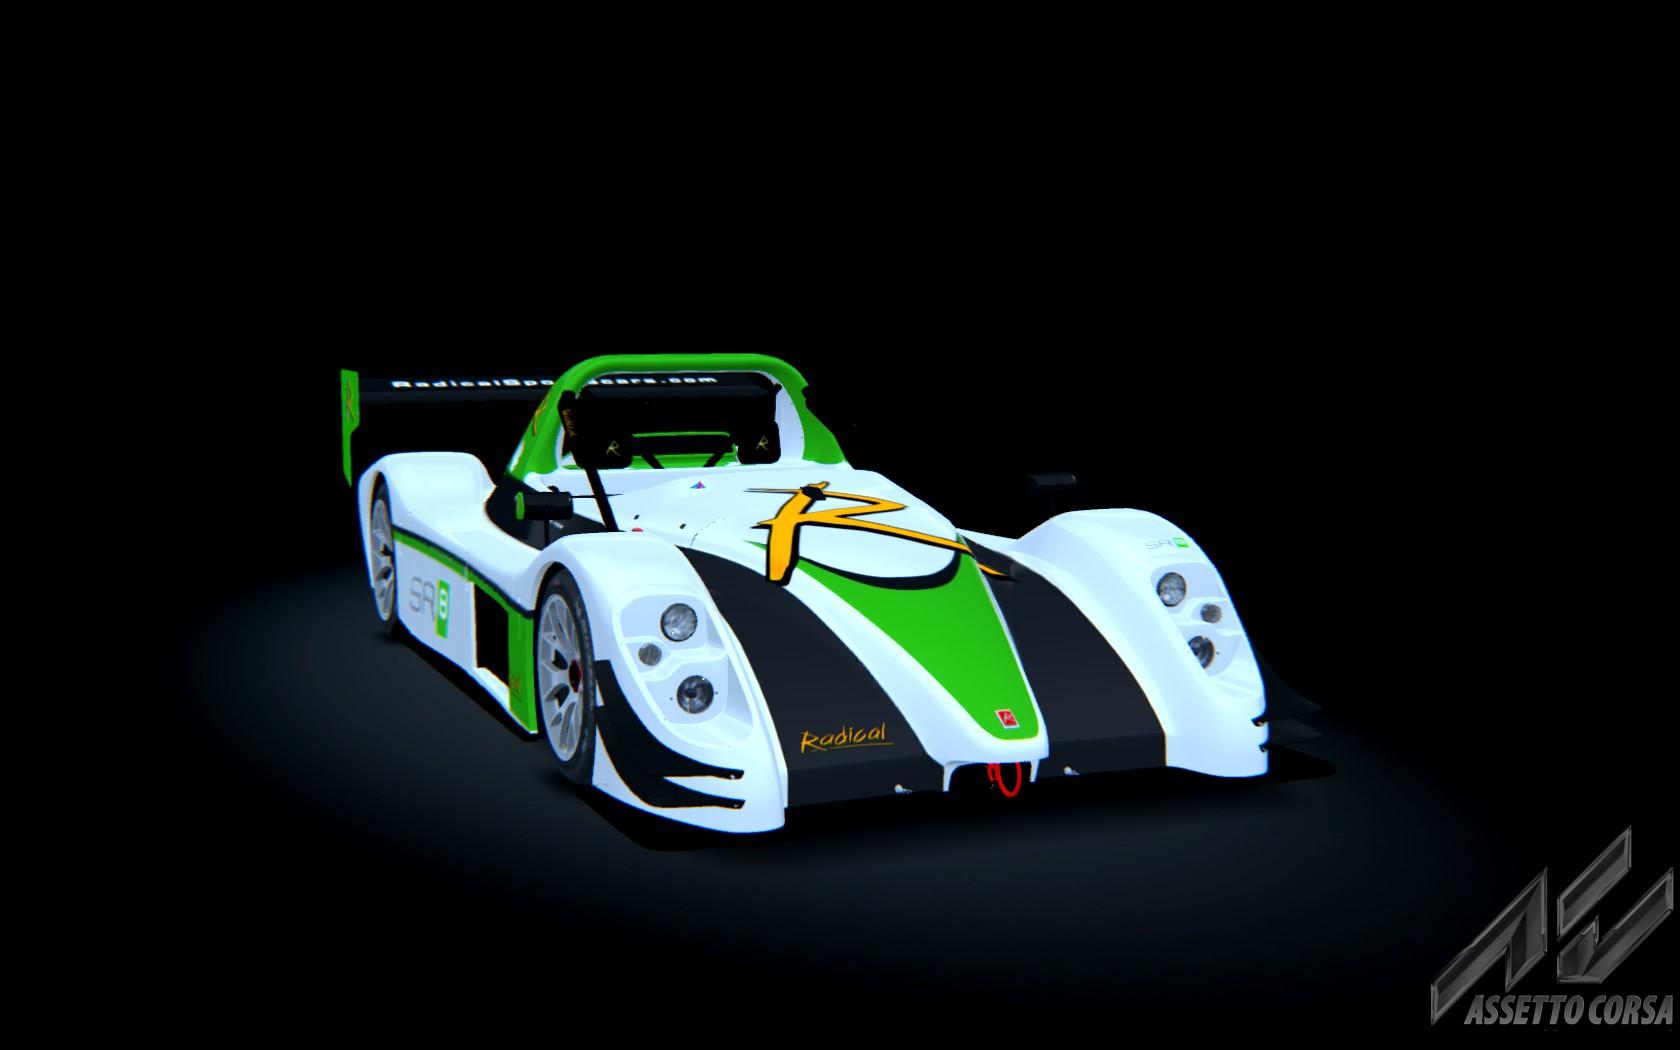 Radical SR8 RX - Radical - Car Detail - Assetto Corsa Database